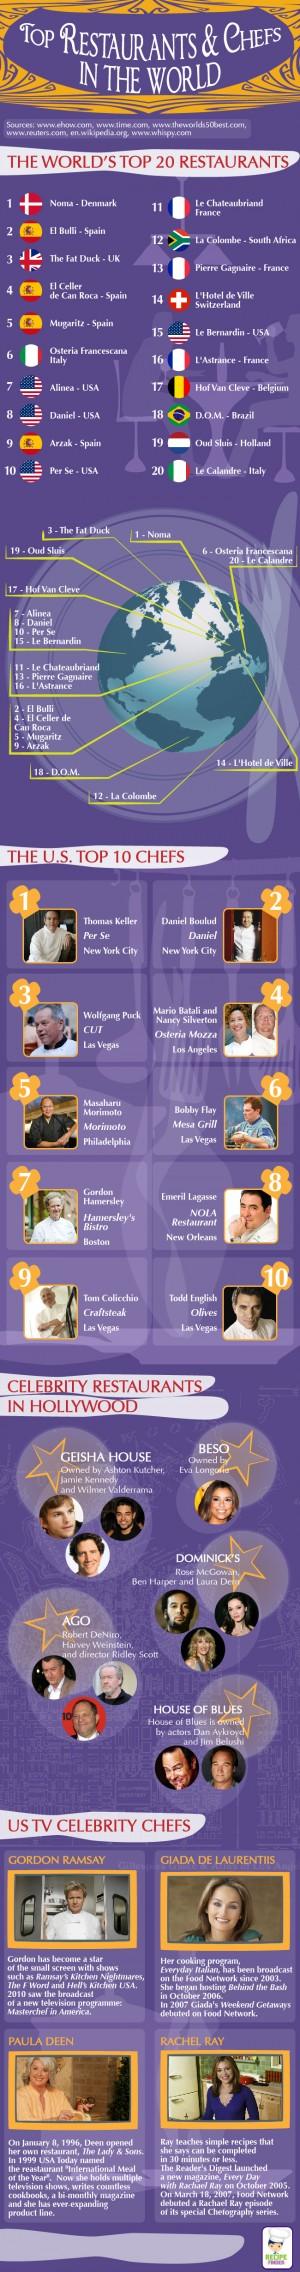 Restaurants & Chefs